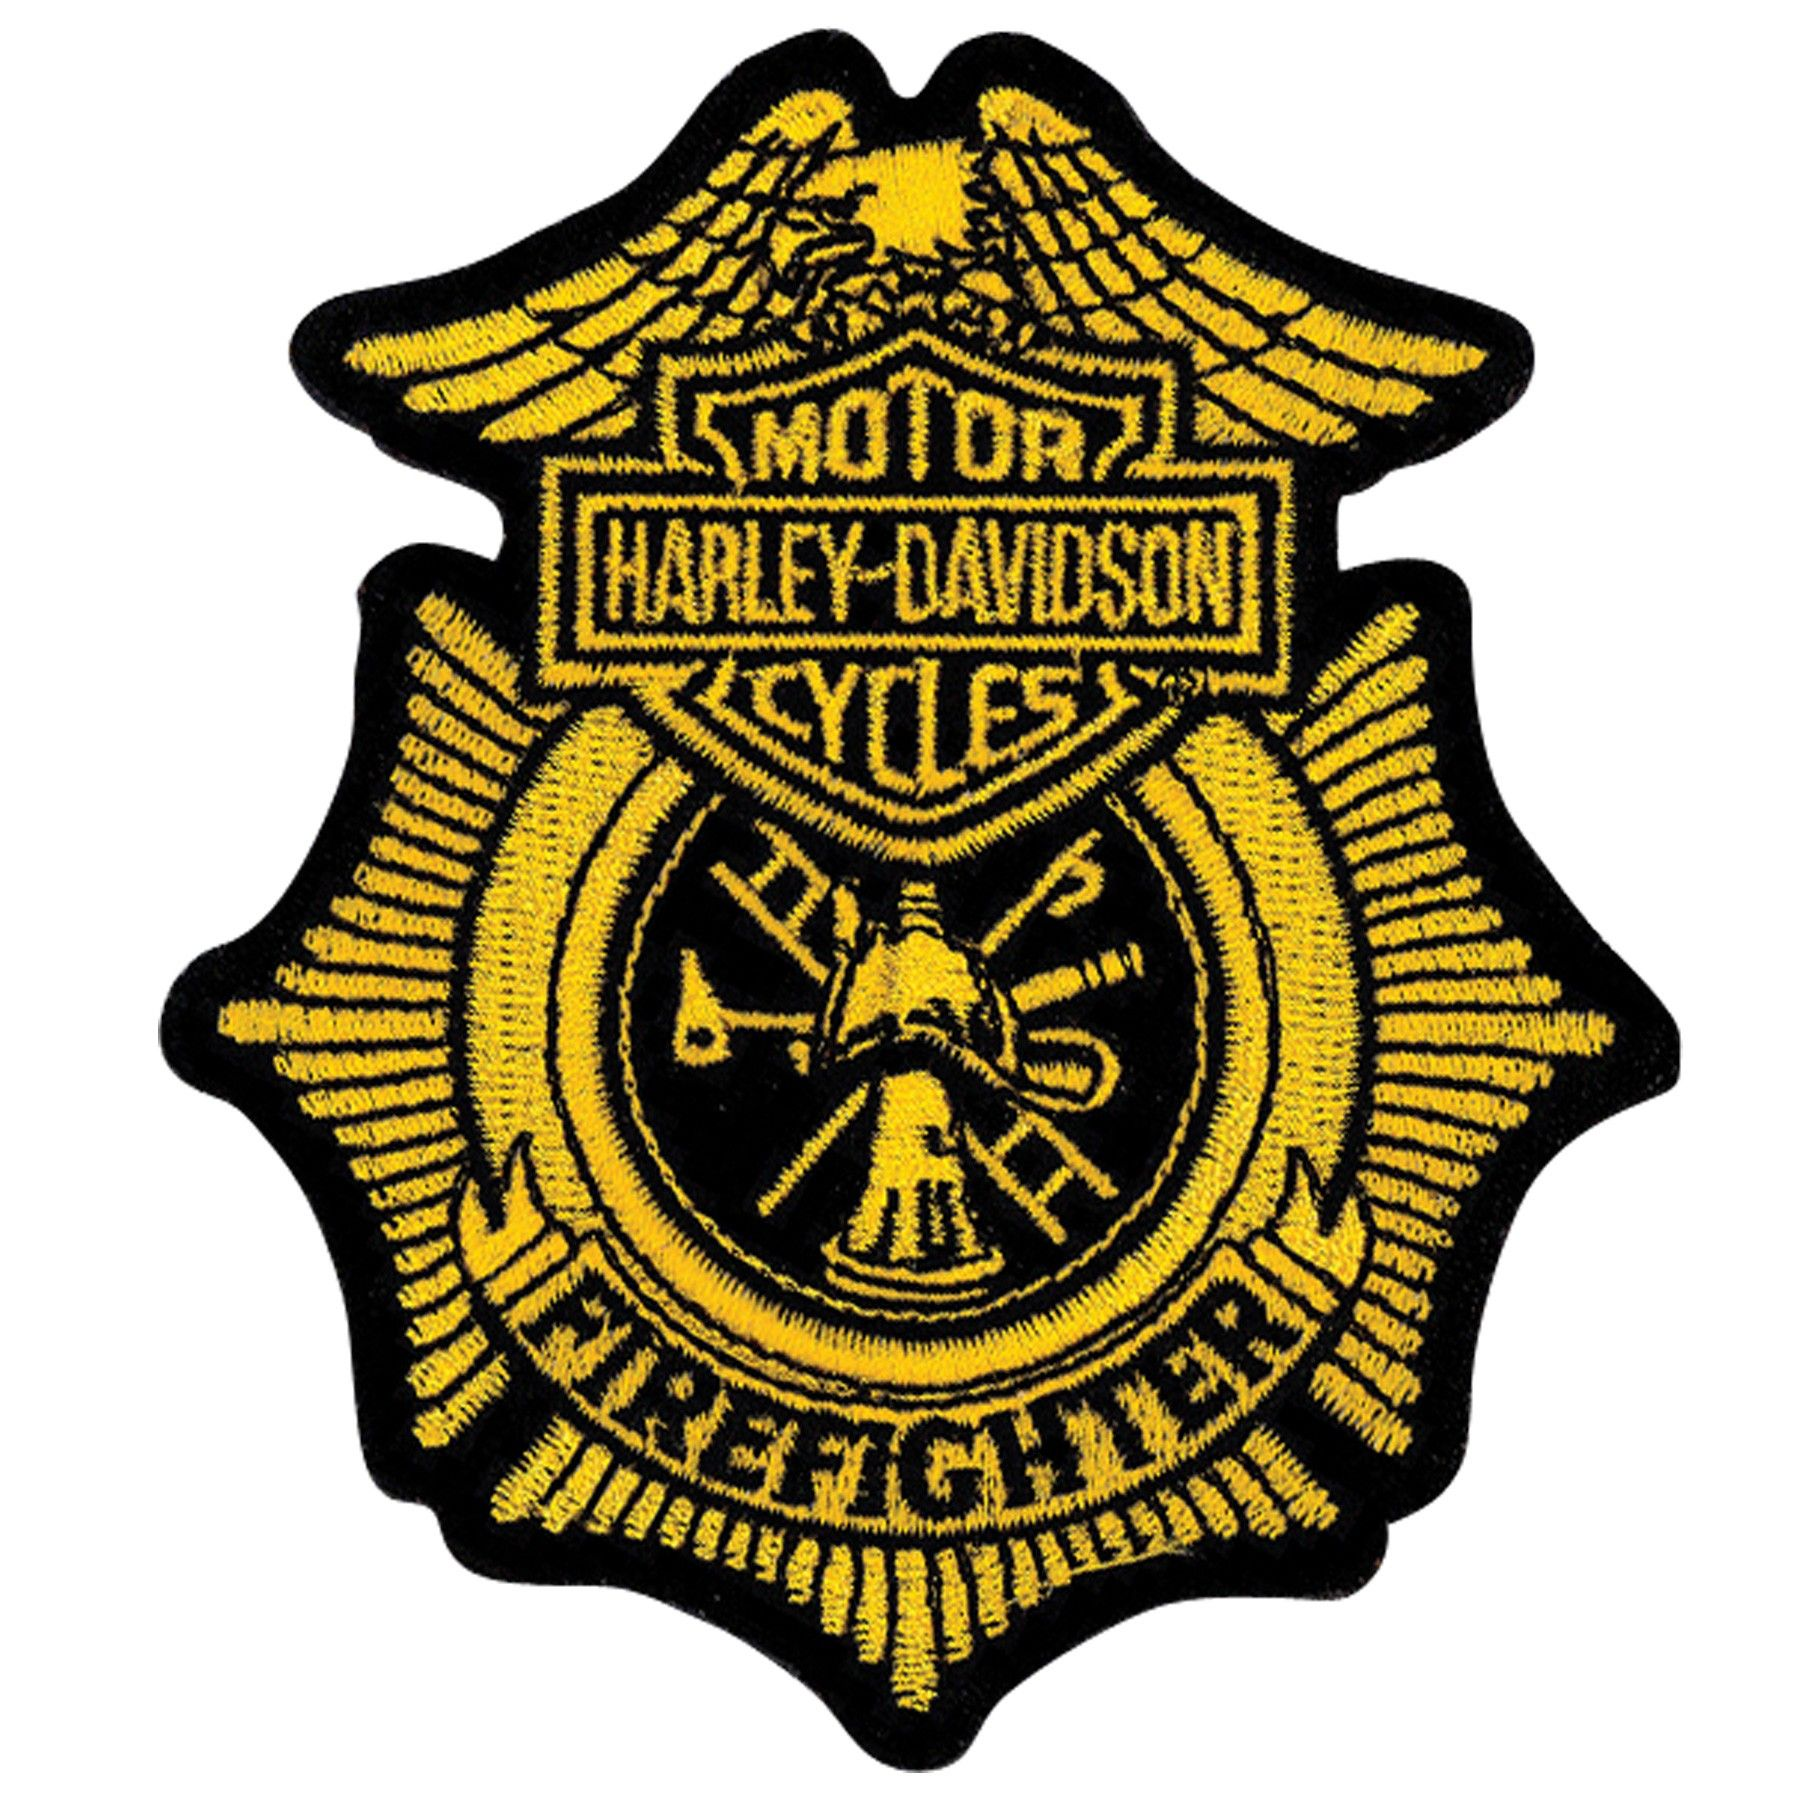 Harley davidson google zoeken bike art pinterest bike art harley davidson firefighter gold patch small w x h measures 3 x gold bar shield eagle firefighter logo size 3 w x h buycottarizona Choice Image